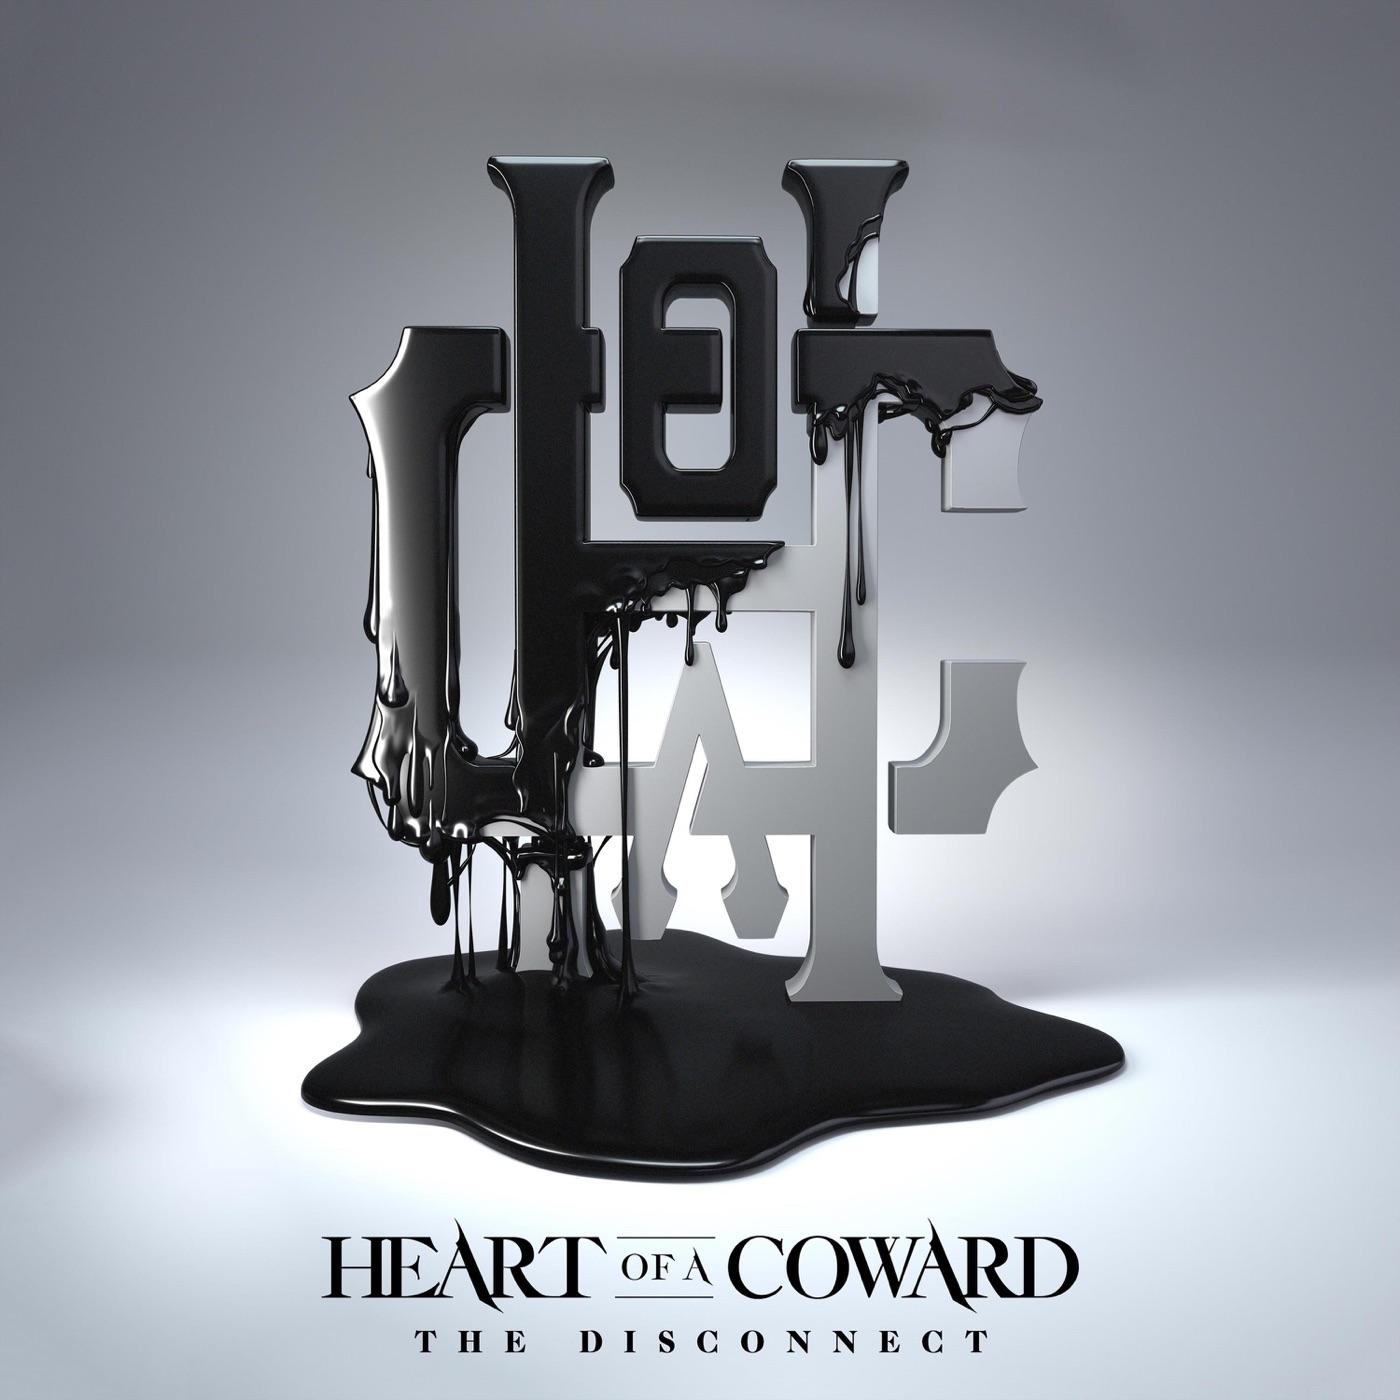 Heart of a Coward - Ritual [Single] (2019)